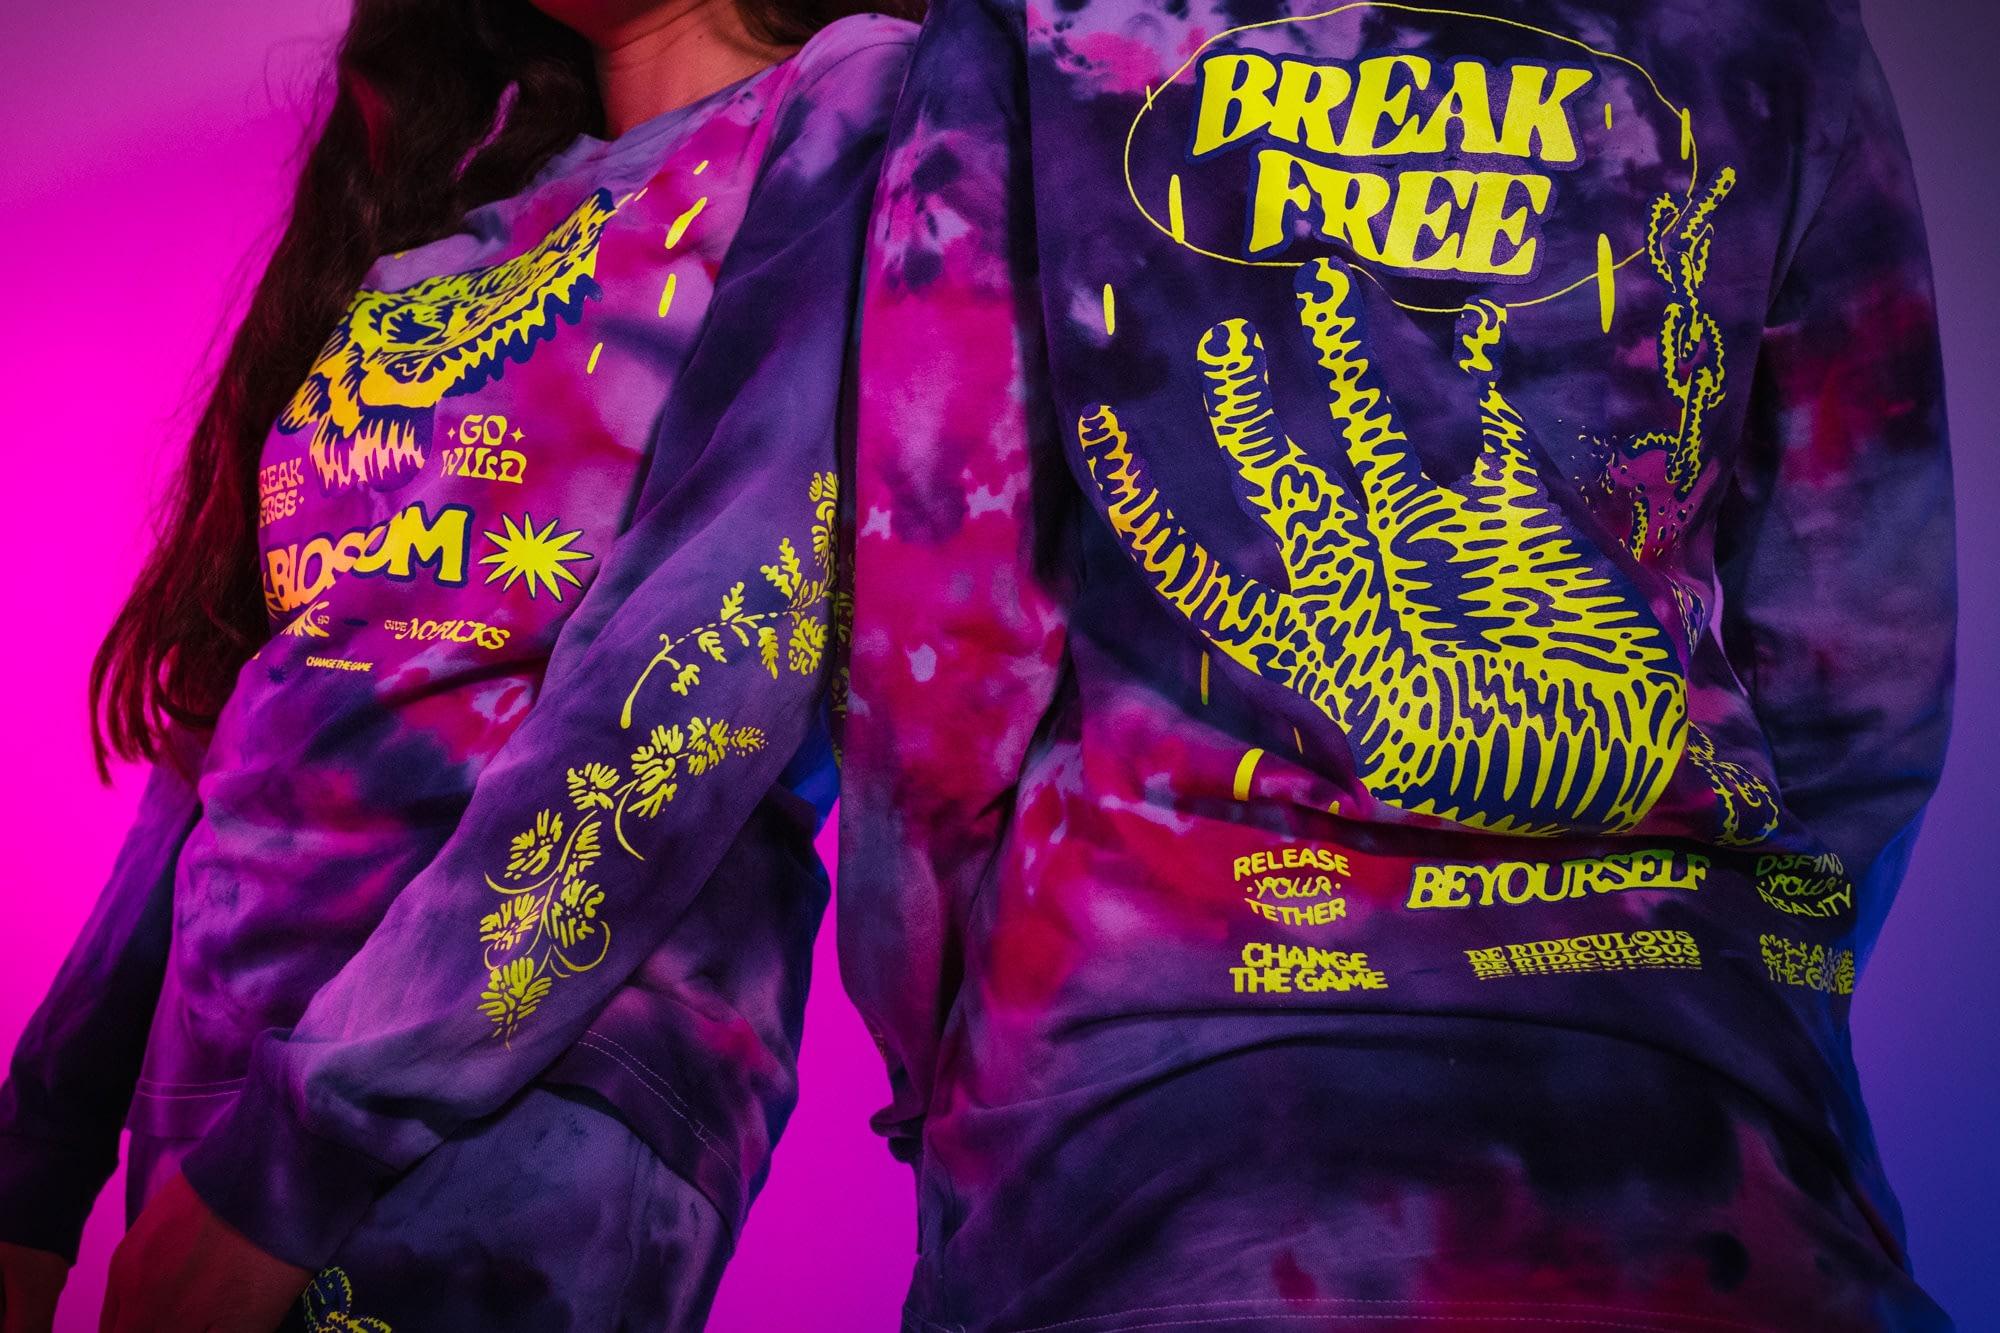 Break Free - Sleeve 2 – Change The Game